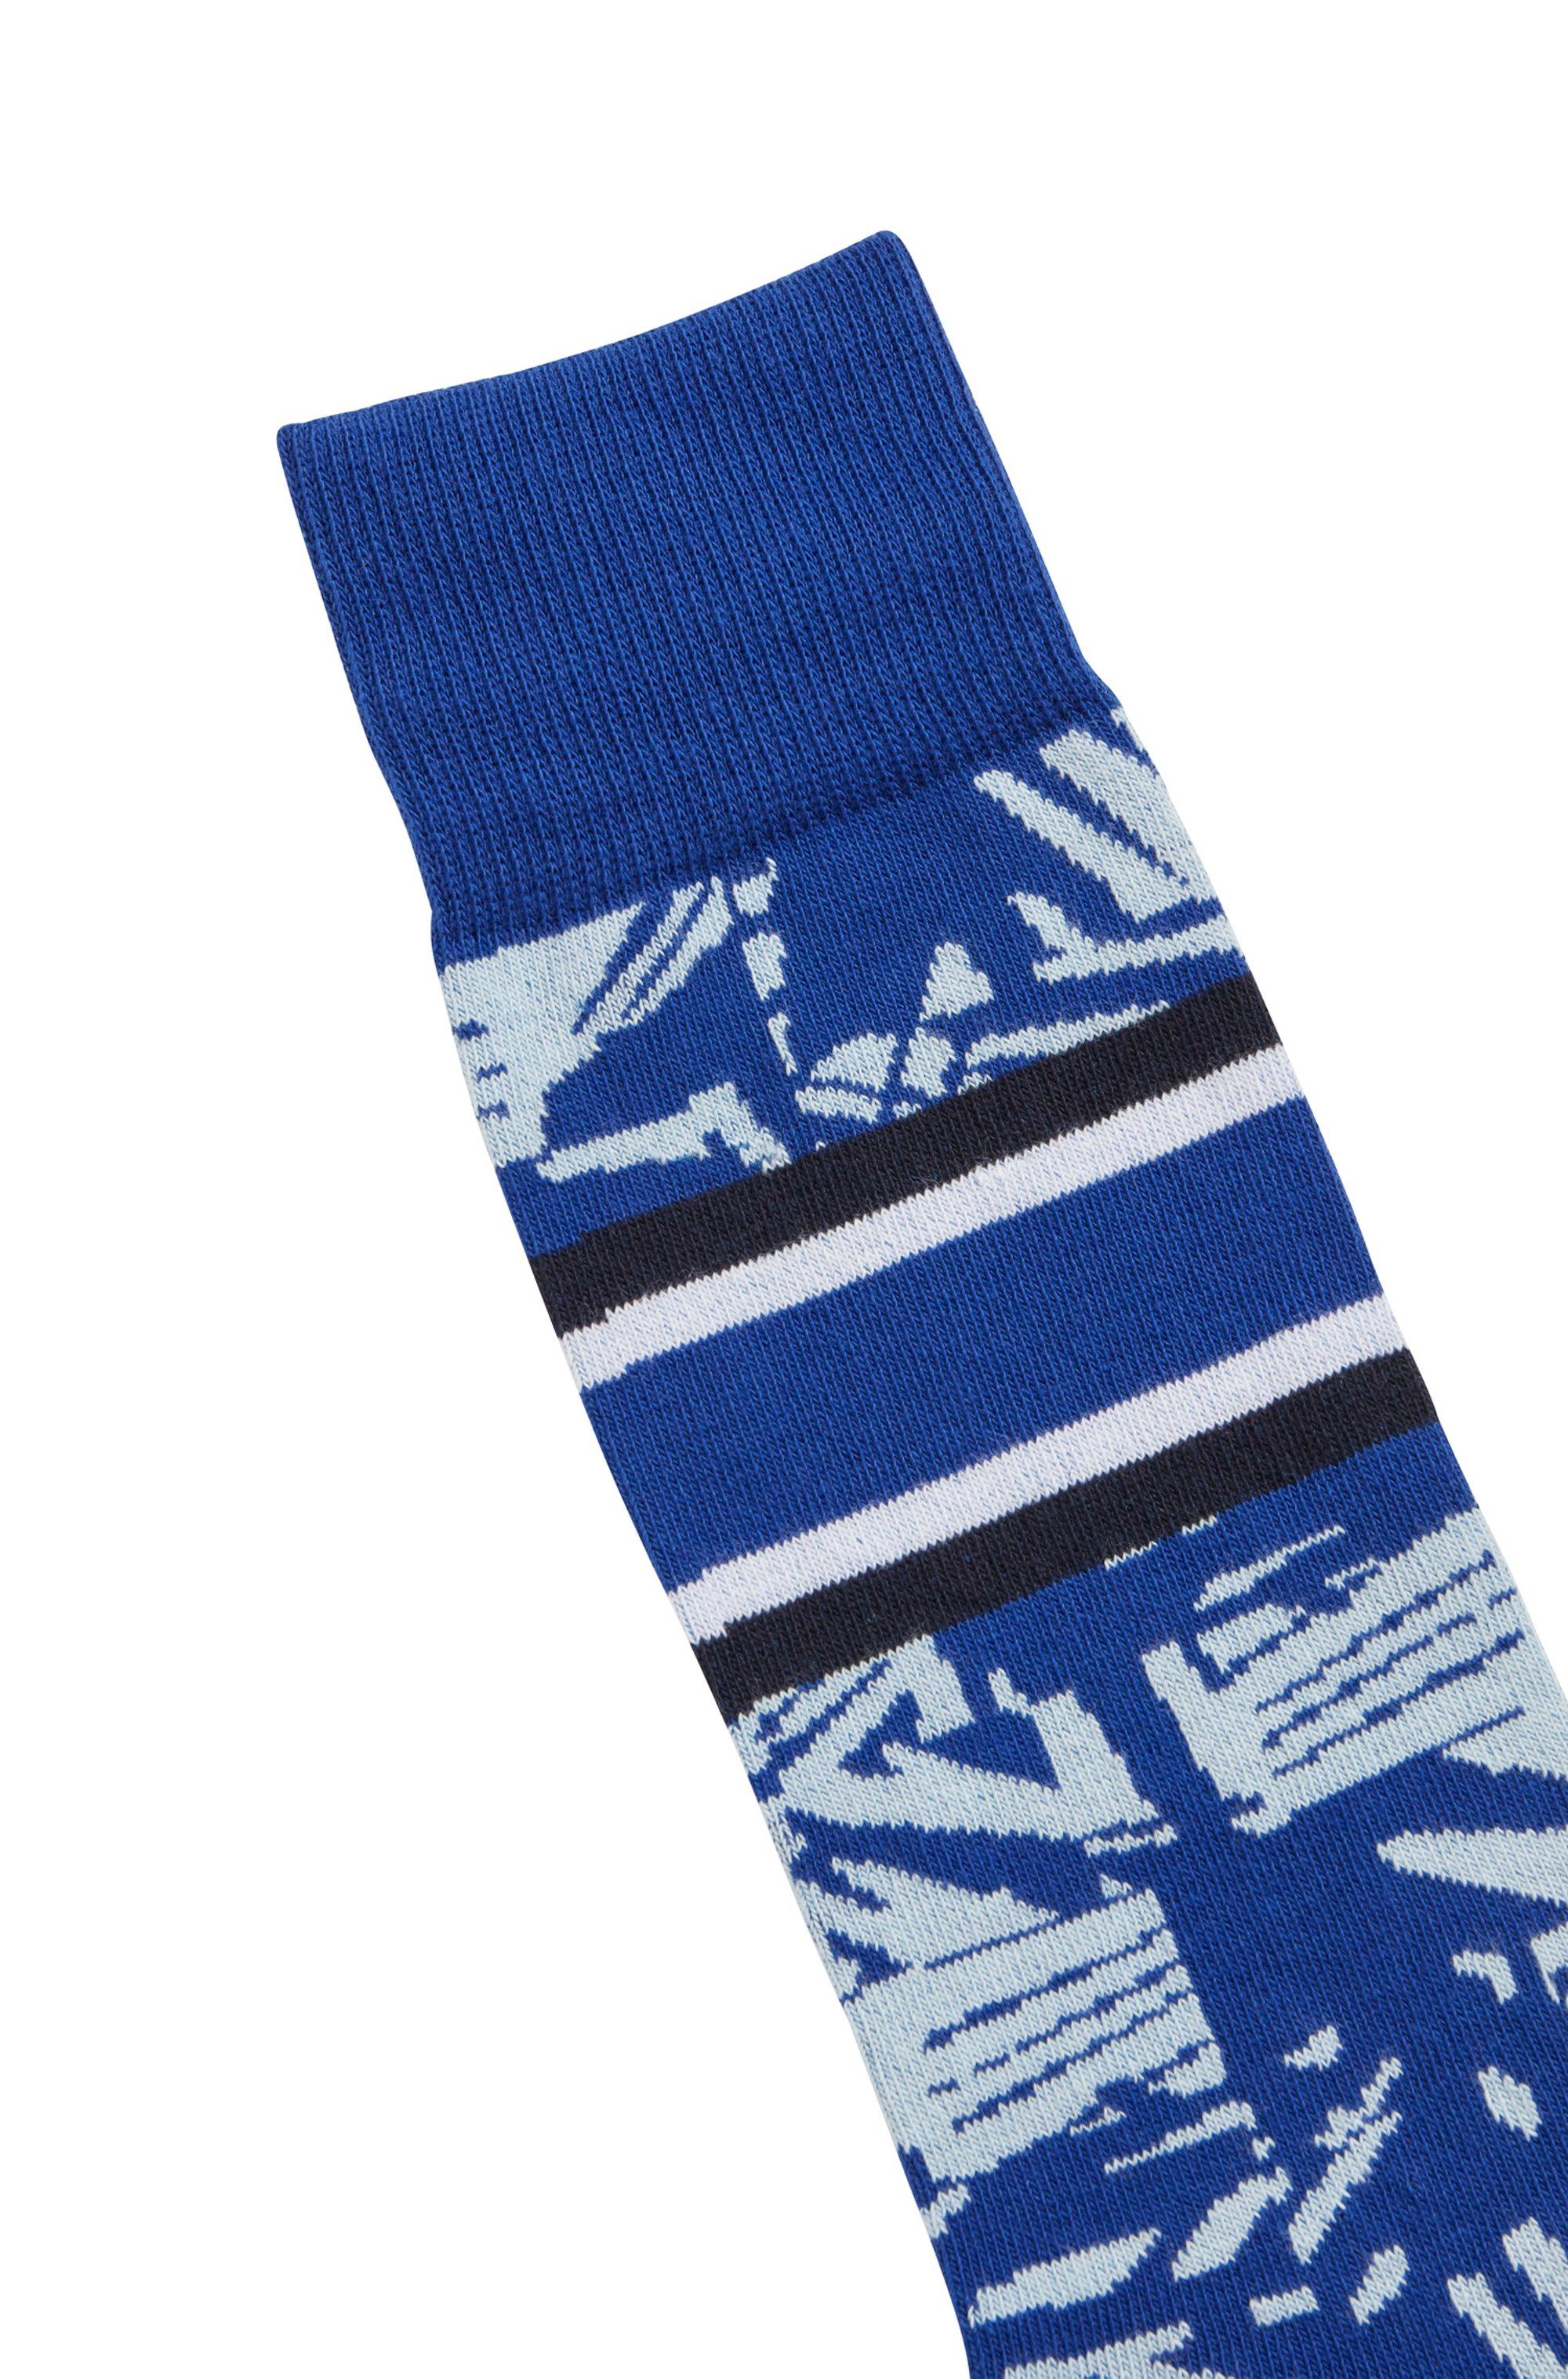 Regular-length patterned socks in an organic-cotton blend